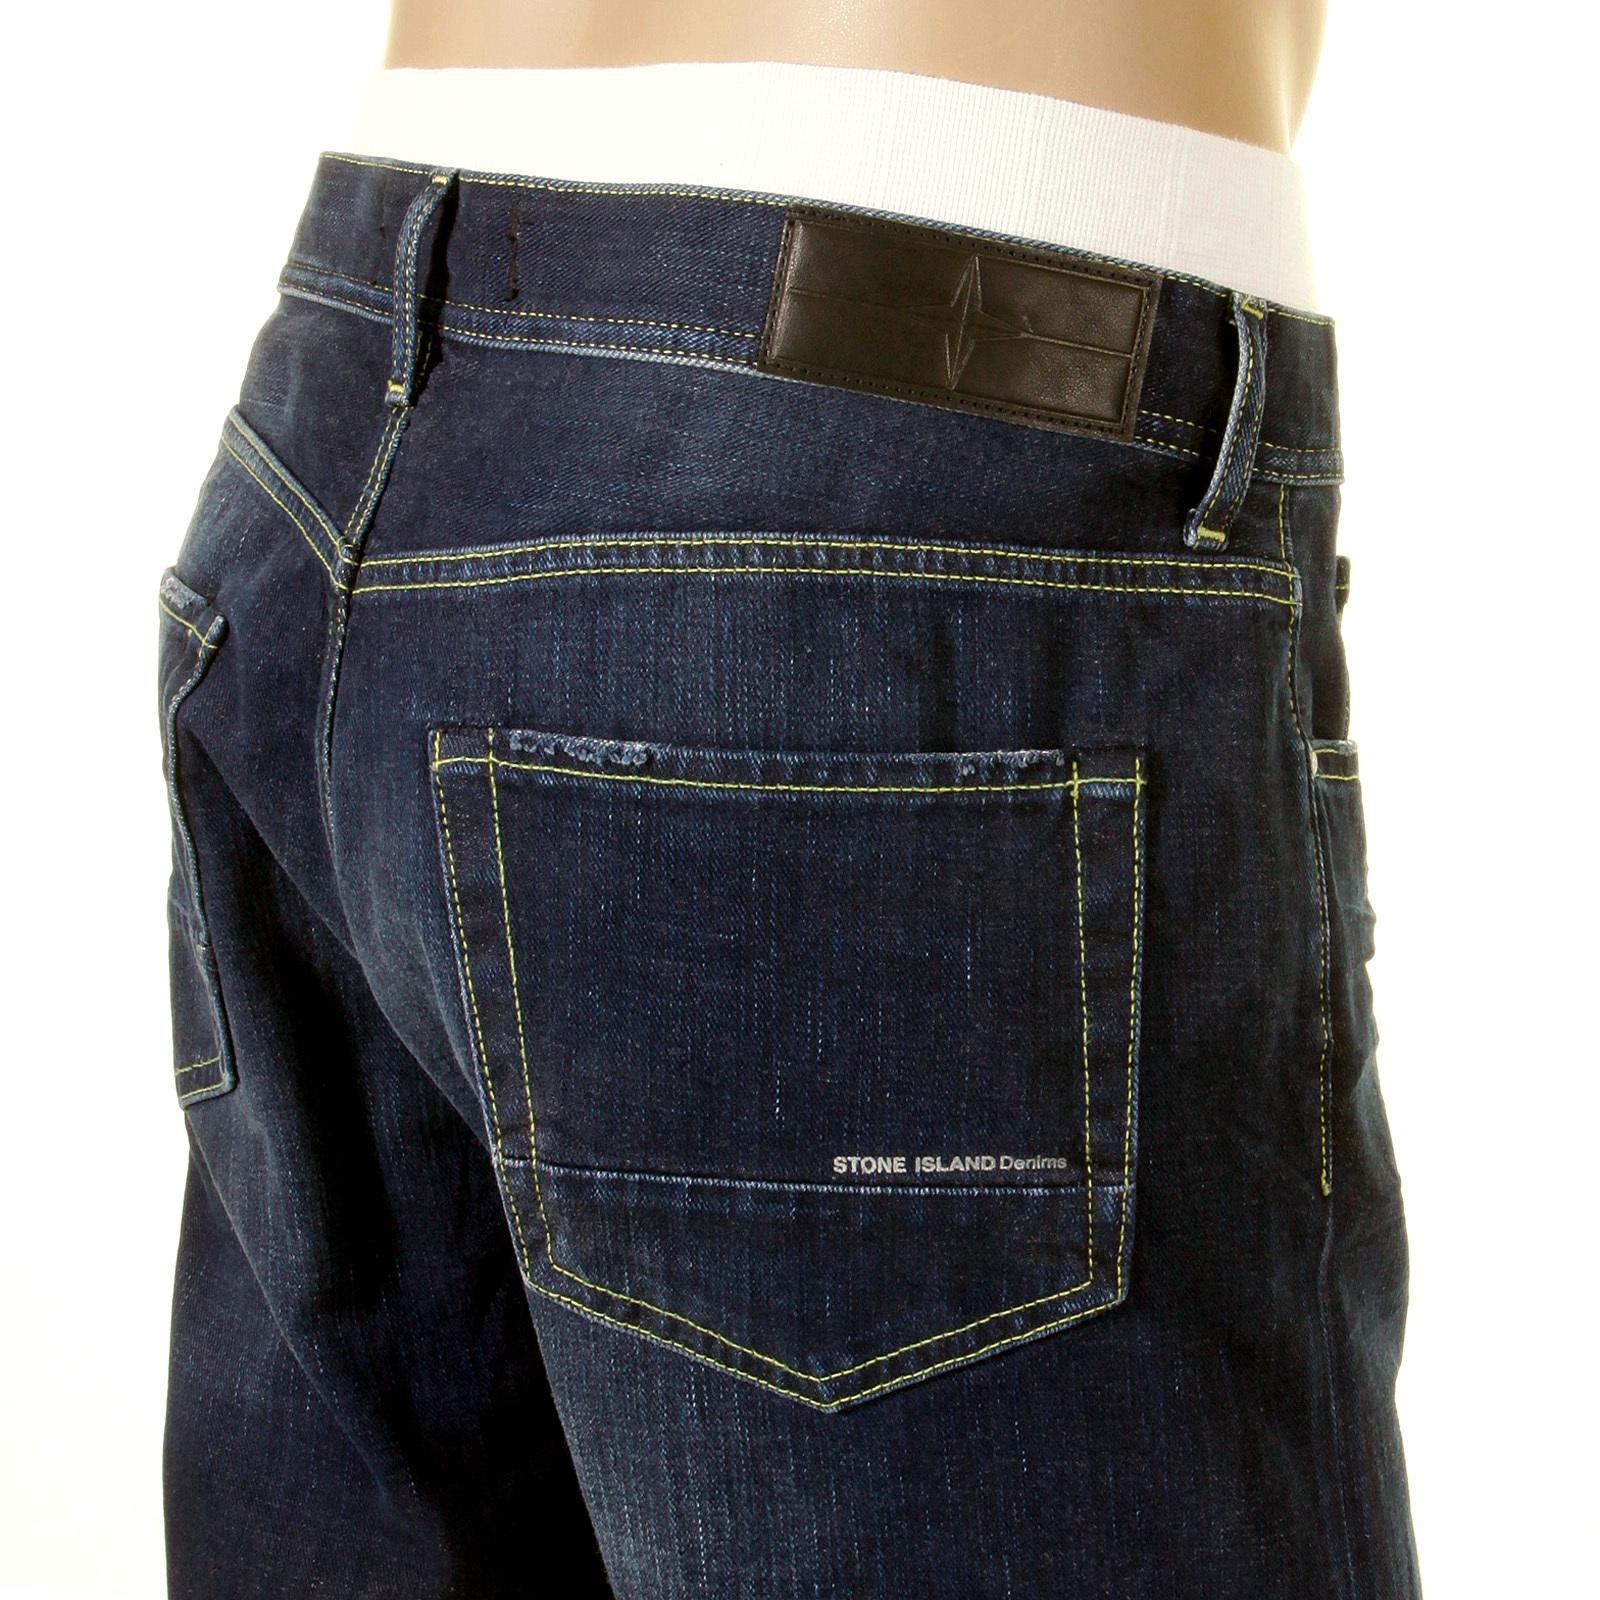 Stone Island Jeans Washed China Blue Denim Jean 511434f4